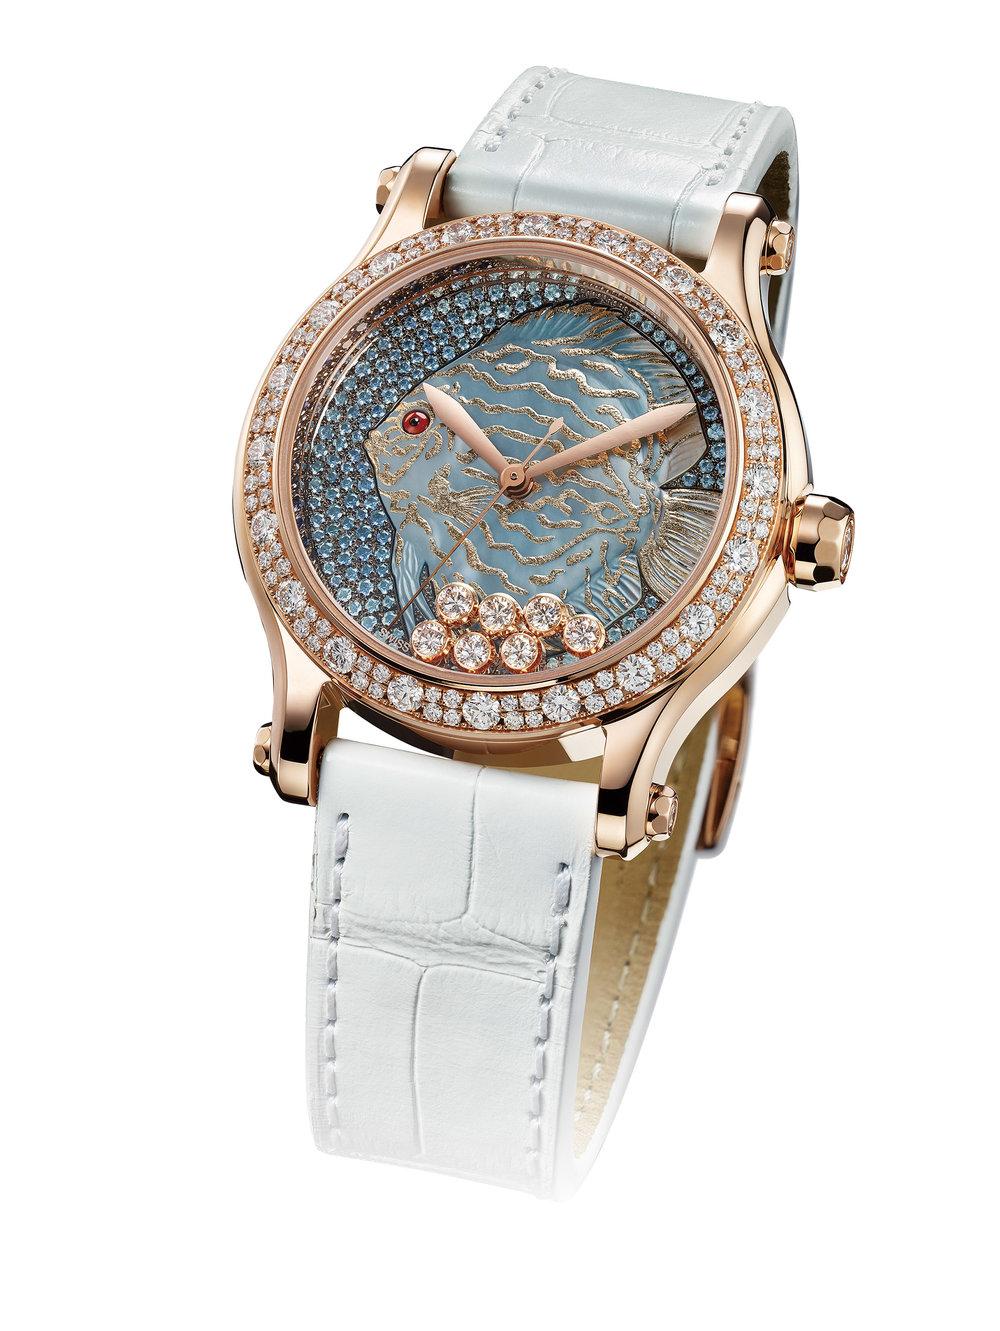 "Chopard  Happy Fish ""Métiers d'Arts"" 36mm Automatic Watch Ref. 274891-5015, $66,430  自蕭邦2002年推出Happy Fish系列以來,錶盤上歡樂躍動的波濤和五彩斑斕的魚兒便吸引了眾人的目光。如今,一條由珍珠貝母和金葉雕琢成的雍容優雅的魚兒再次躍然而出,獨特的夜光設計,令魚兒在夜晚愈加栩栩如生。錶盤上七顆自由活動的鑽石,如海底浮動的氣泡,與魚身周圍雪花式鑲嵌的漸變藍寶石交相輝映。防水30米,限量25枚。  At Lugaro Jewellers, (604) 925-2043, chopard.com"